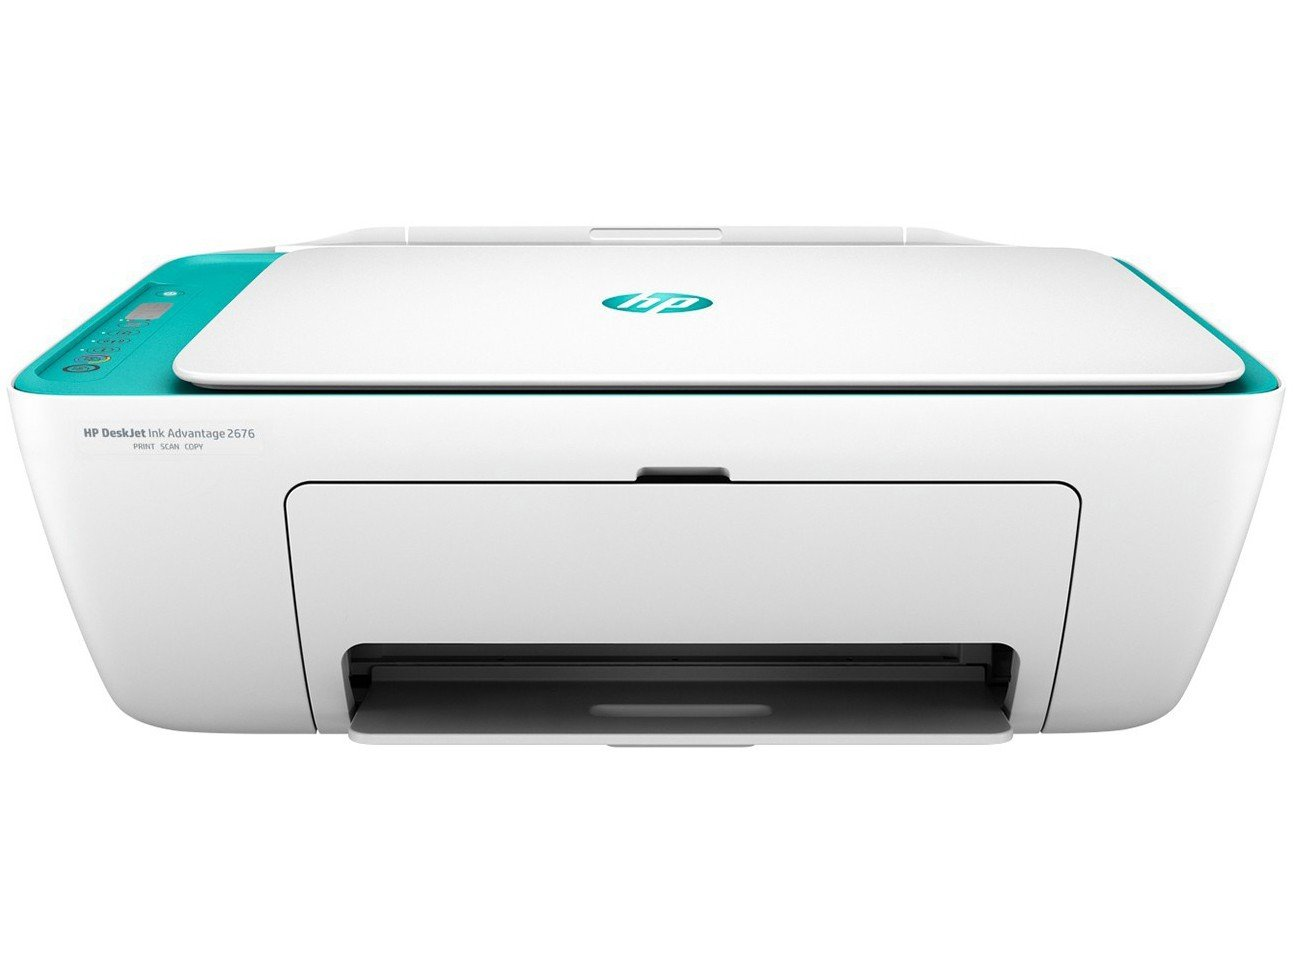 Foto 3 - Impressora Multifuncional HP Deskjet Ink Advantage - 2676 Jato de Tinta Wi-Fi Colorida USB